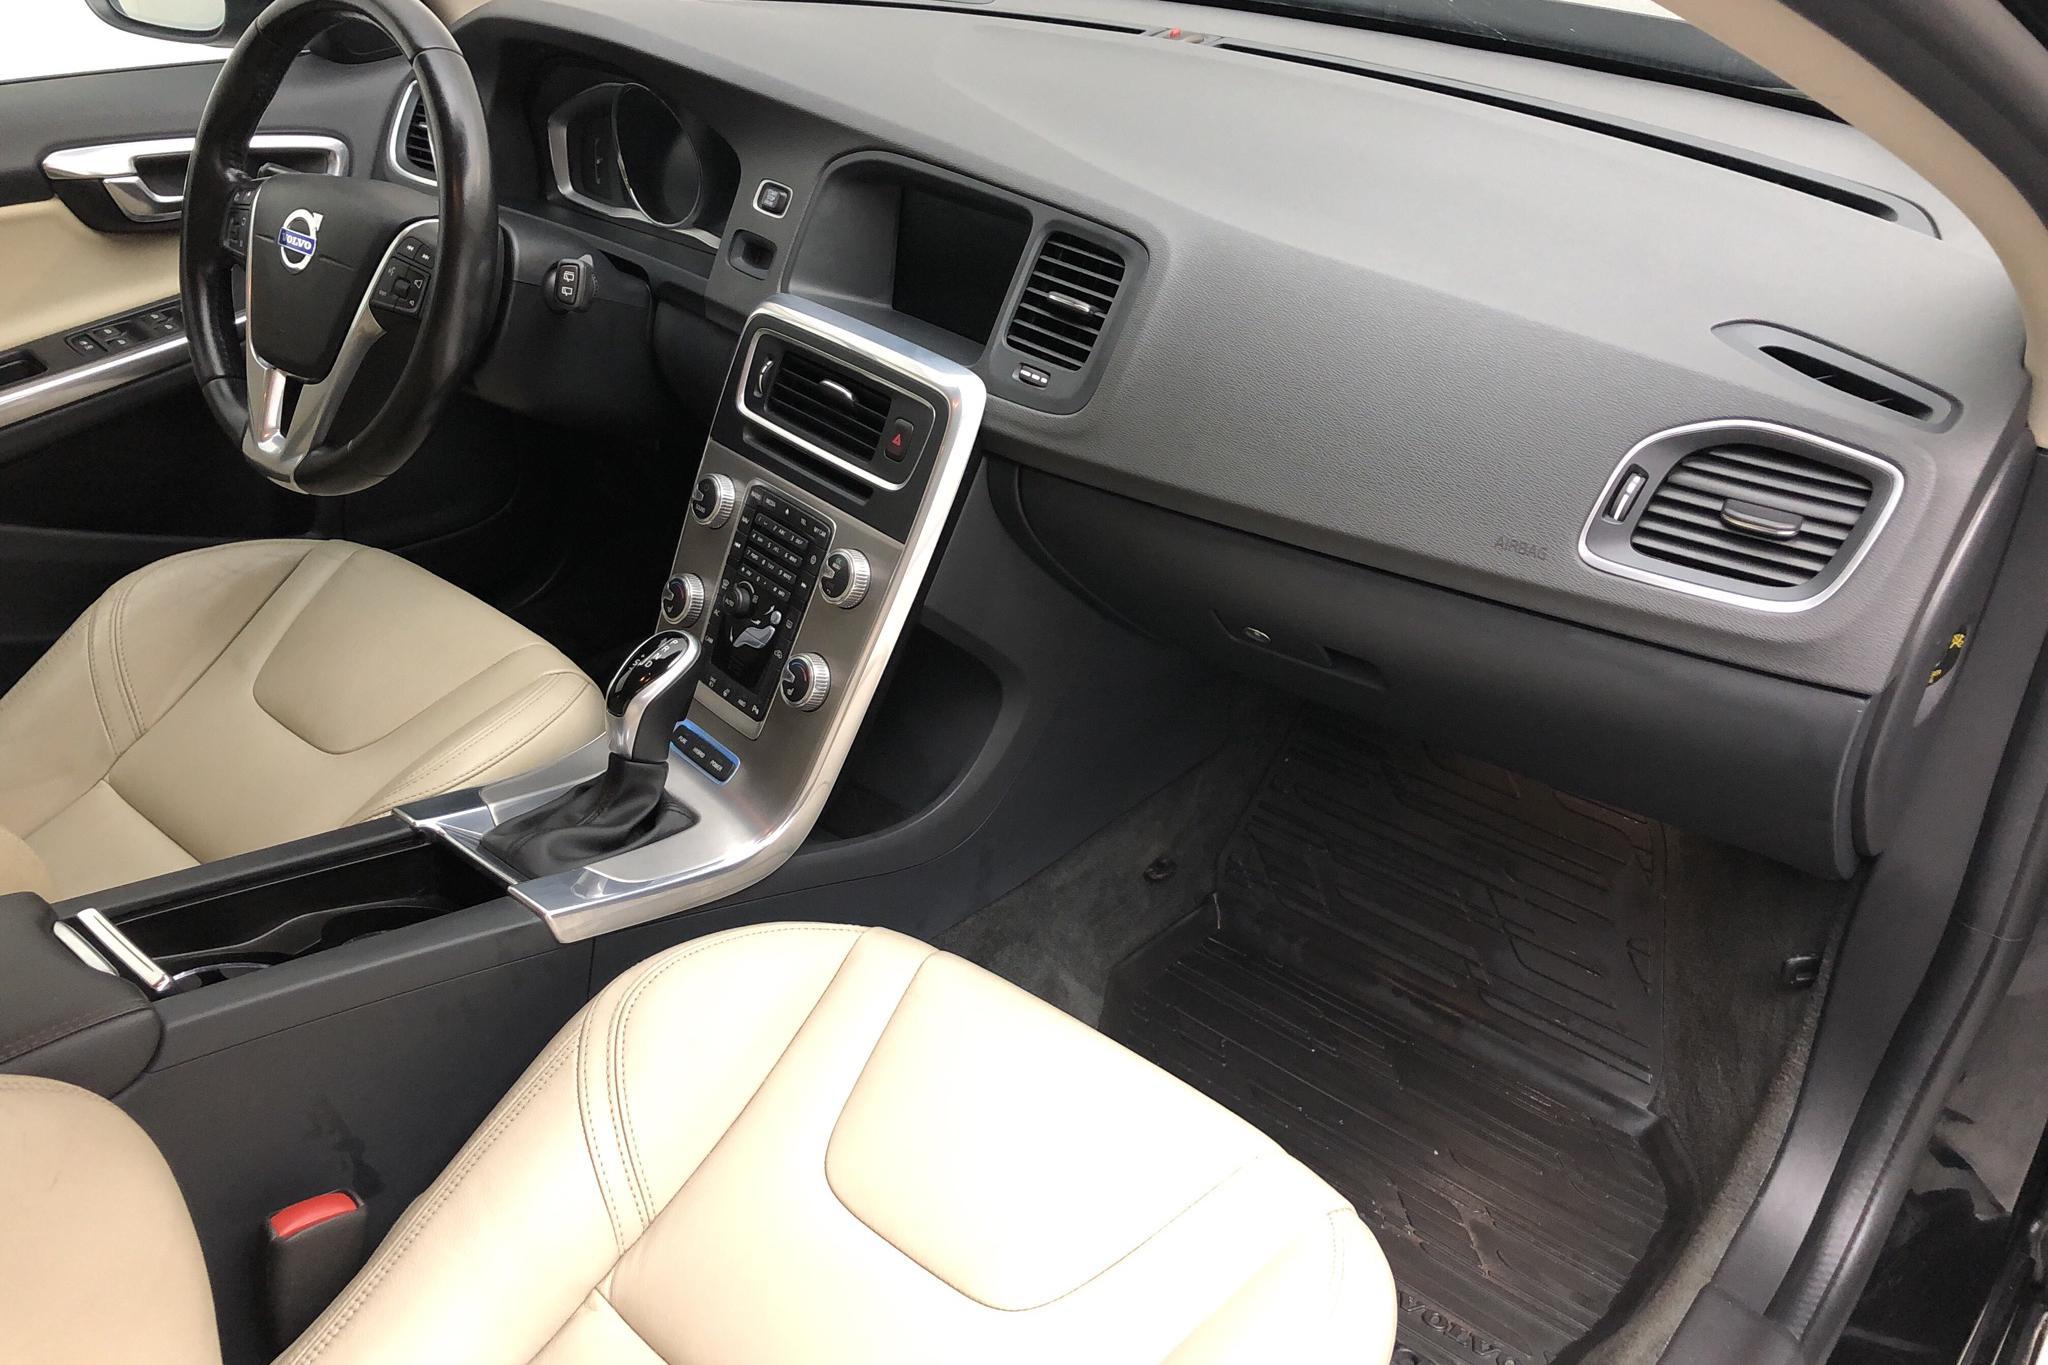 Volvo V60 D5 AWD Twin Engine (163hk) - 149 530 km - Automatic - black - 2016